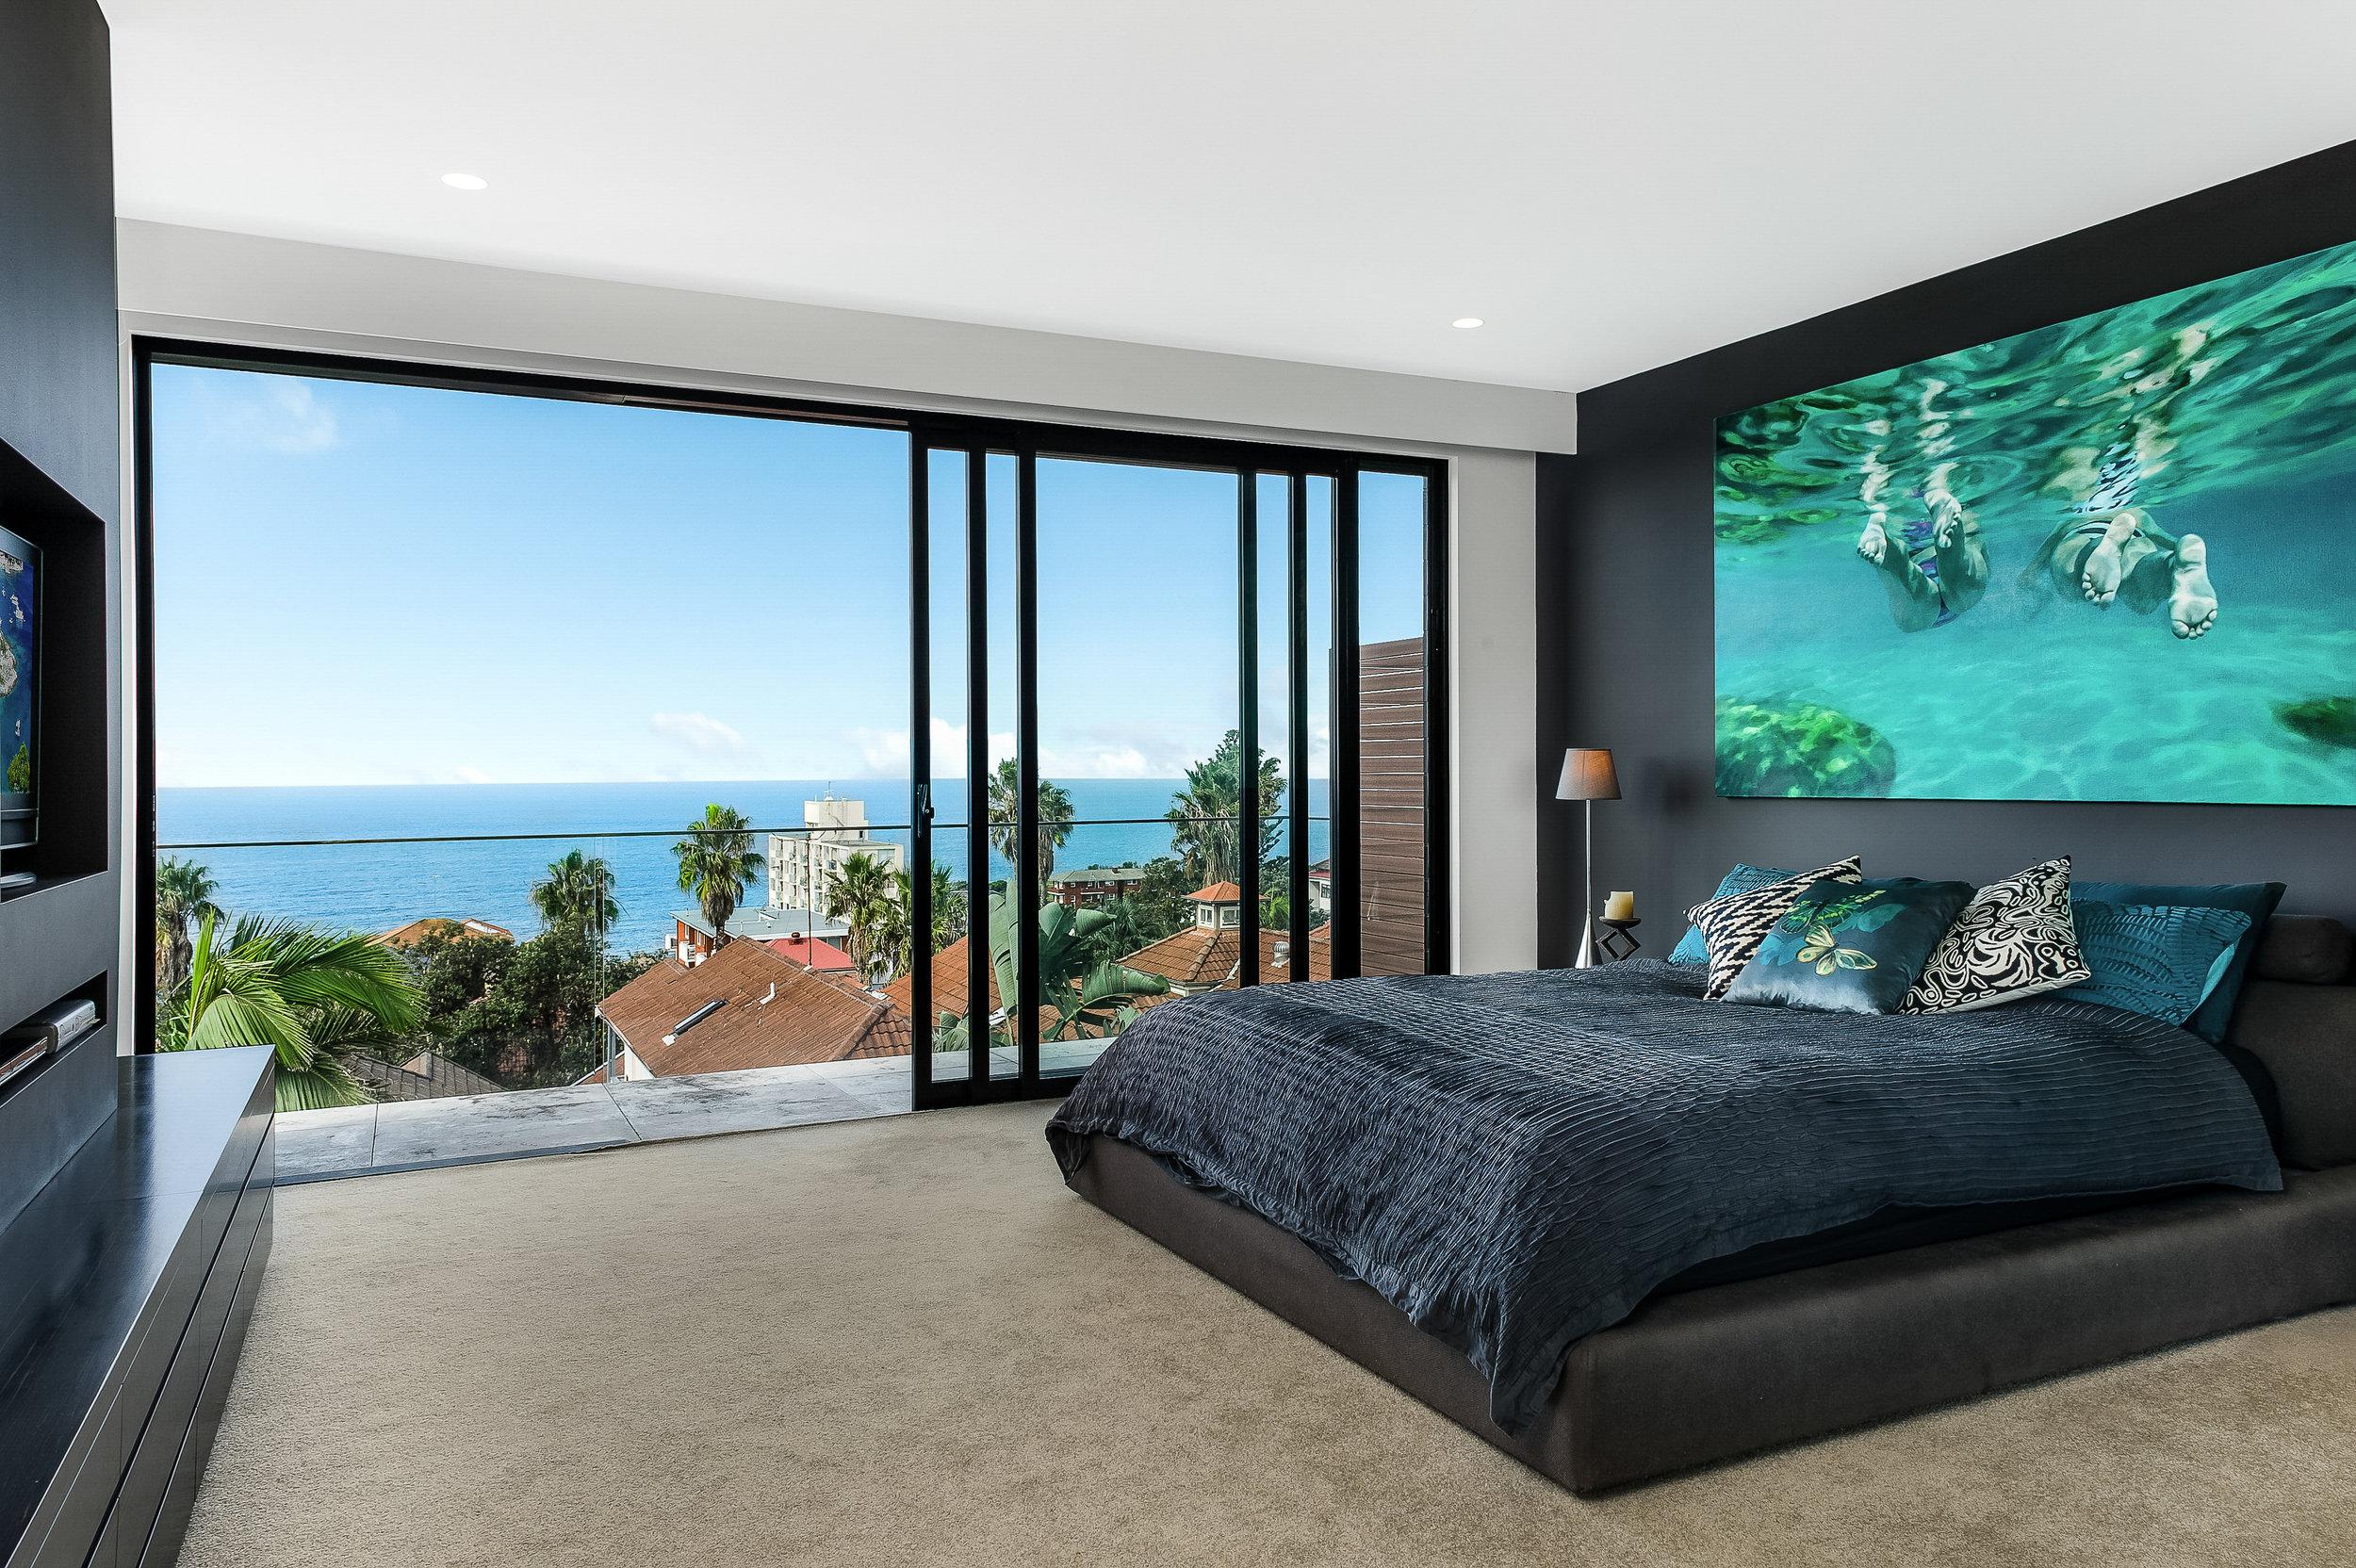 Kiama Shellharbour Gerringong Berry Wollongong South Coast Illawarra Real Estate Photographer Bedroom Photographer1-2.jpg